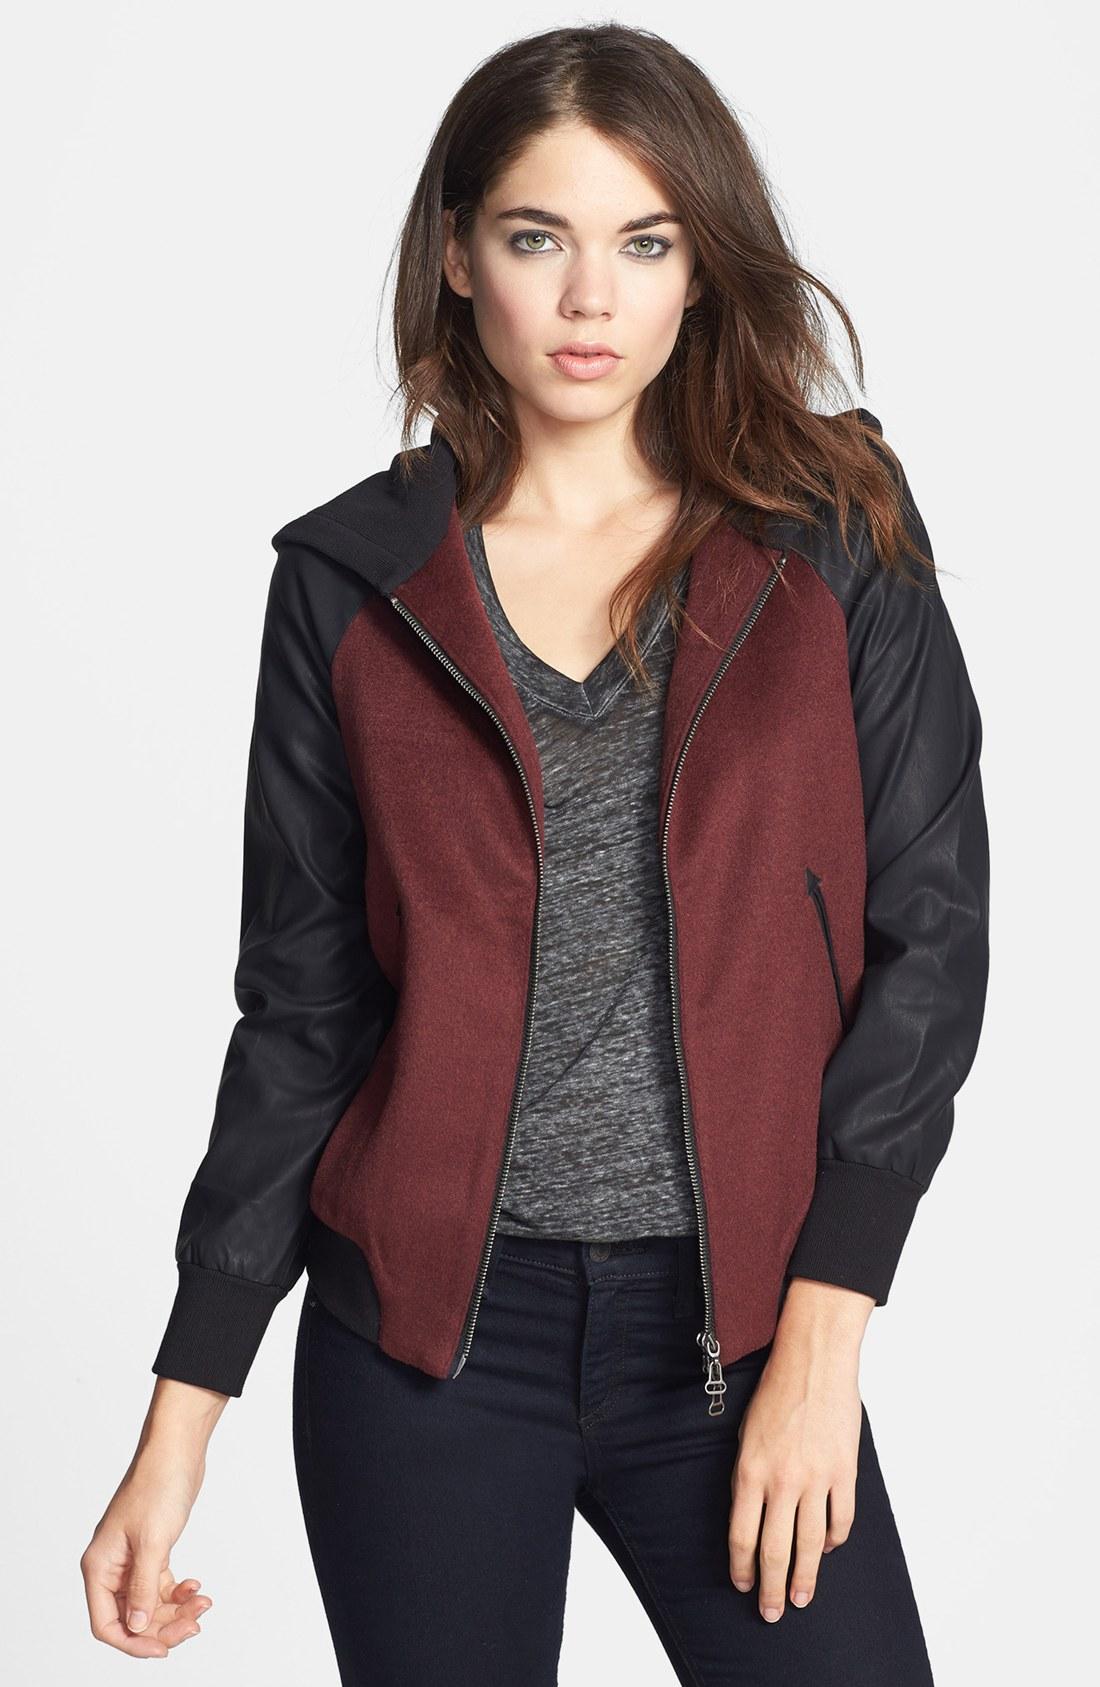 Dolce vita leather jacket